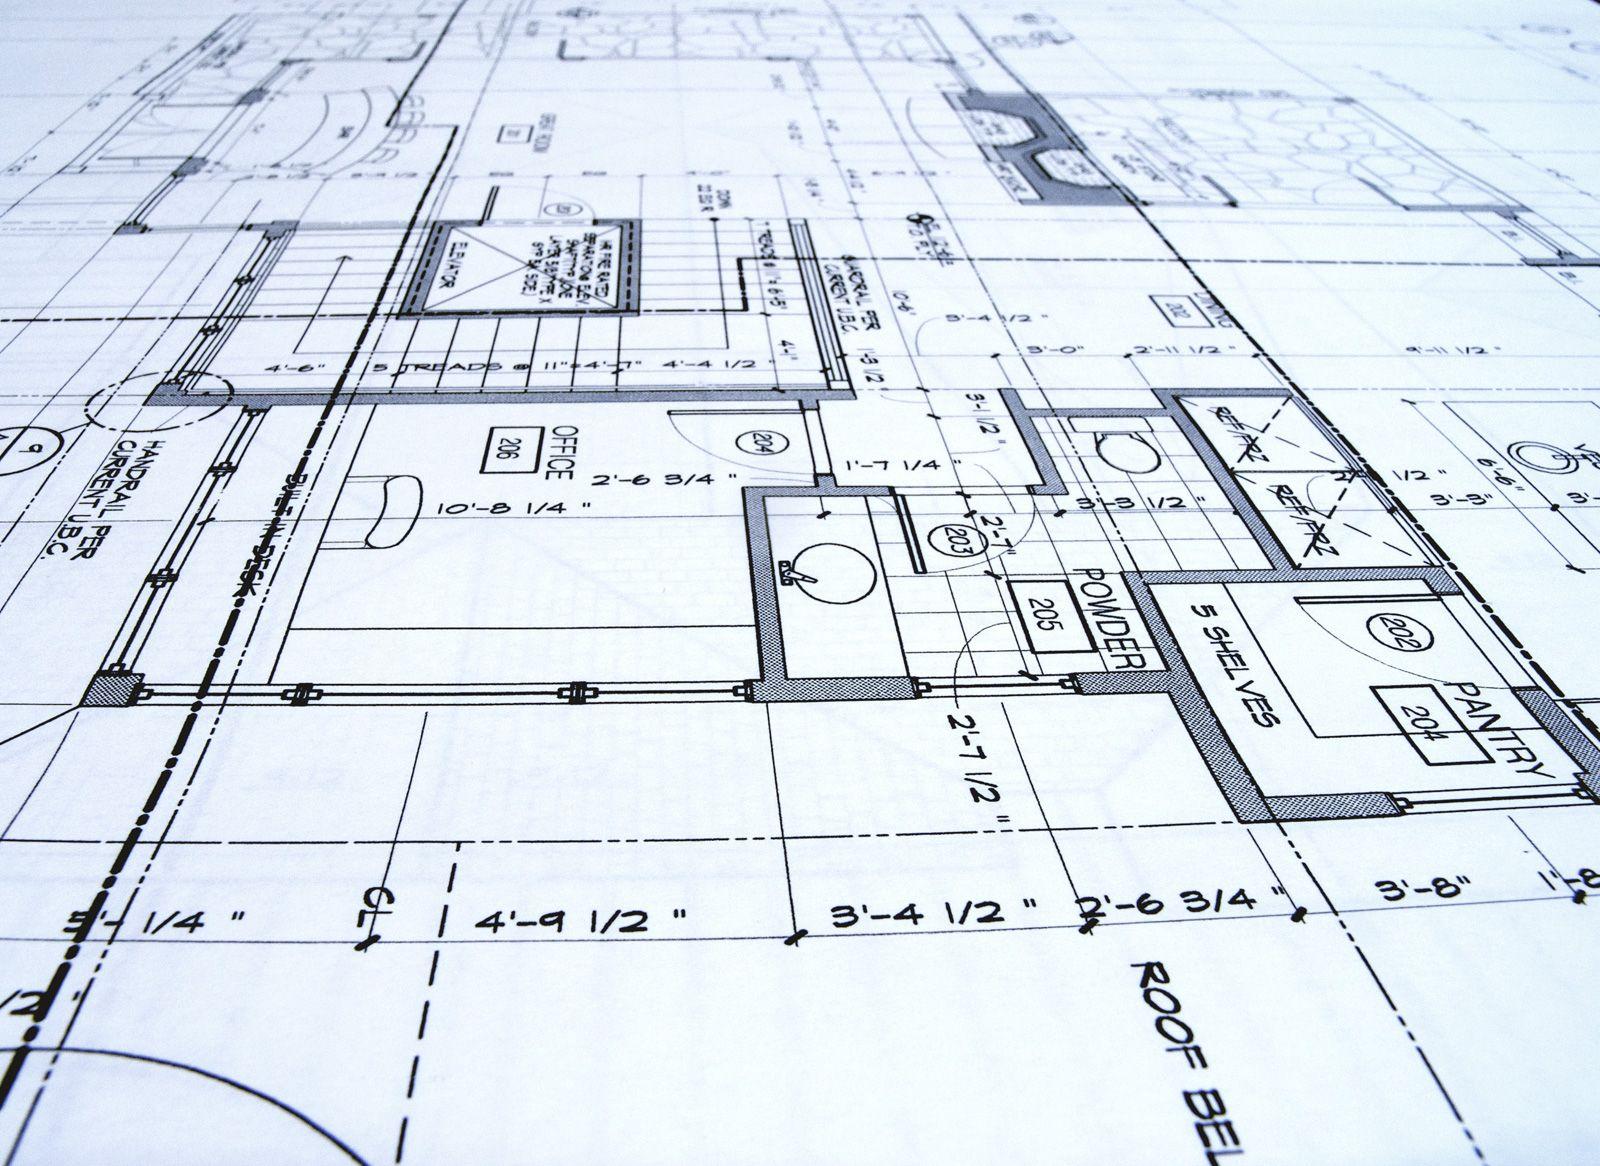 good 3d building scheme and floor plans ideas for house and office design building scheme building office pantry